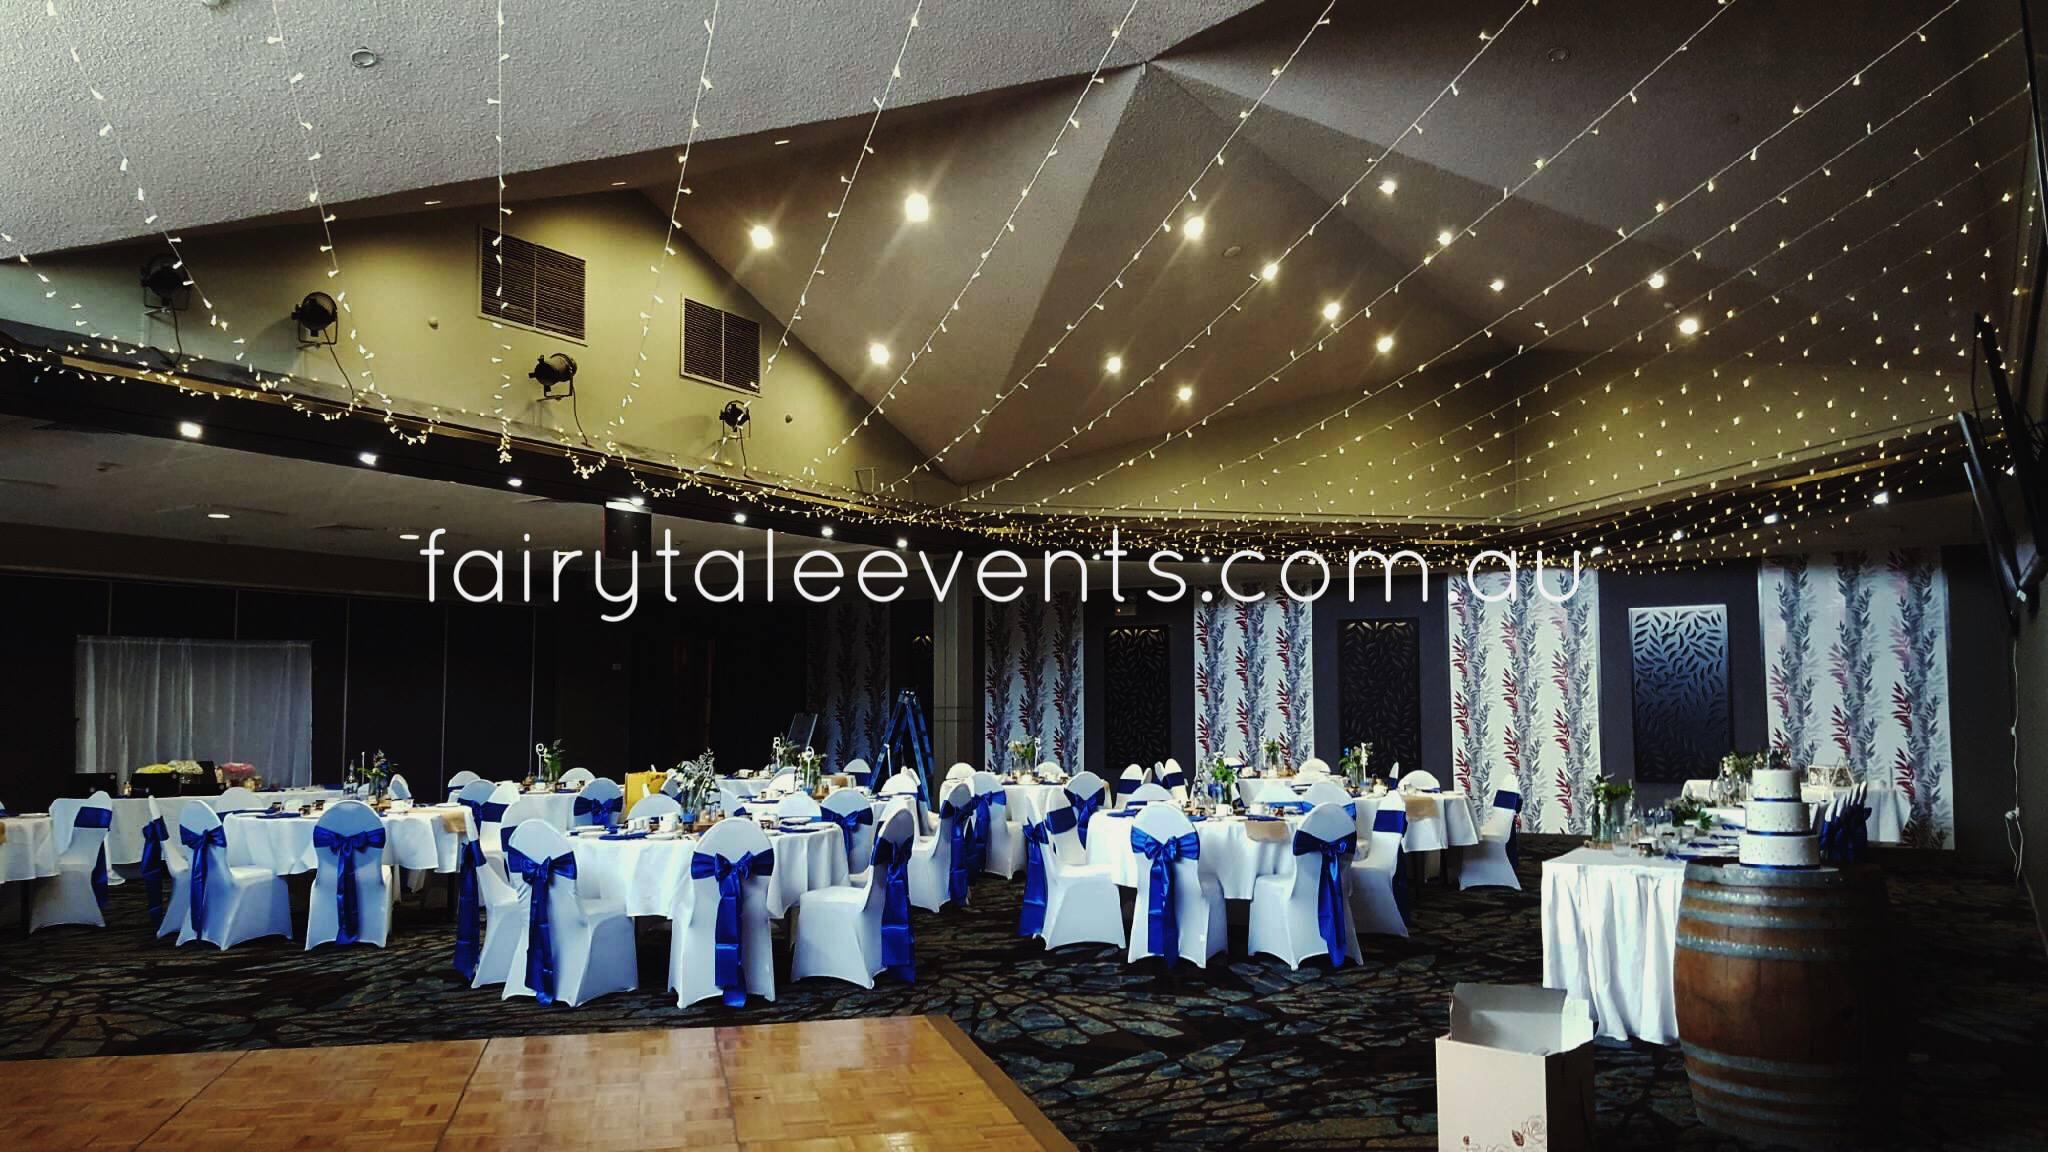 Horizontal fairy light canopy by Fairytale Events - Panania Diggers RSL